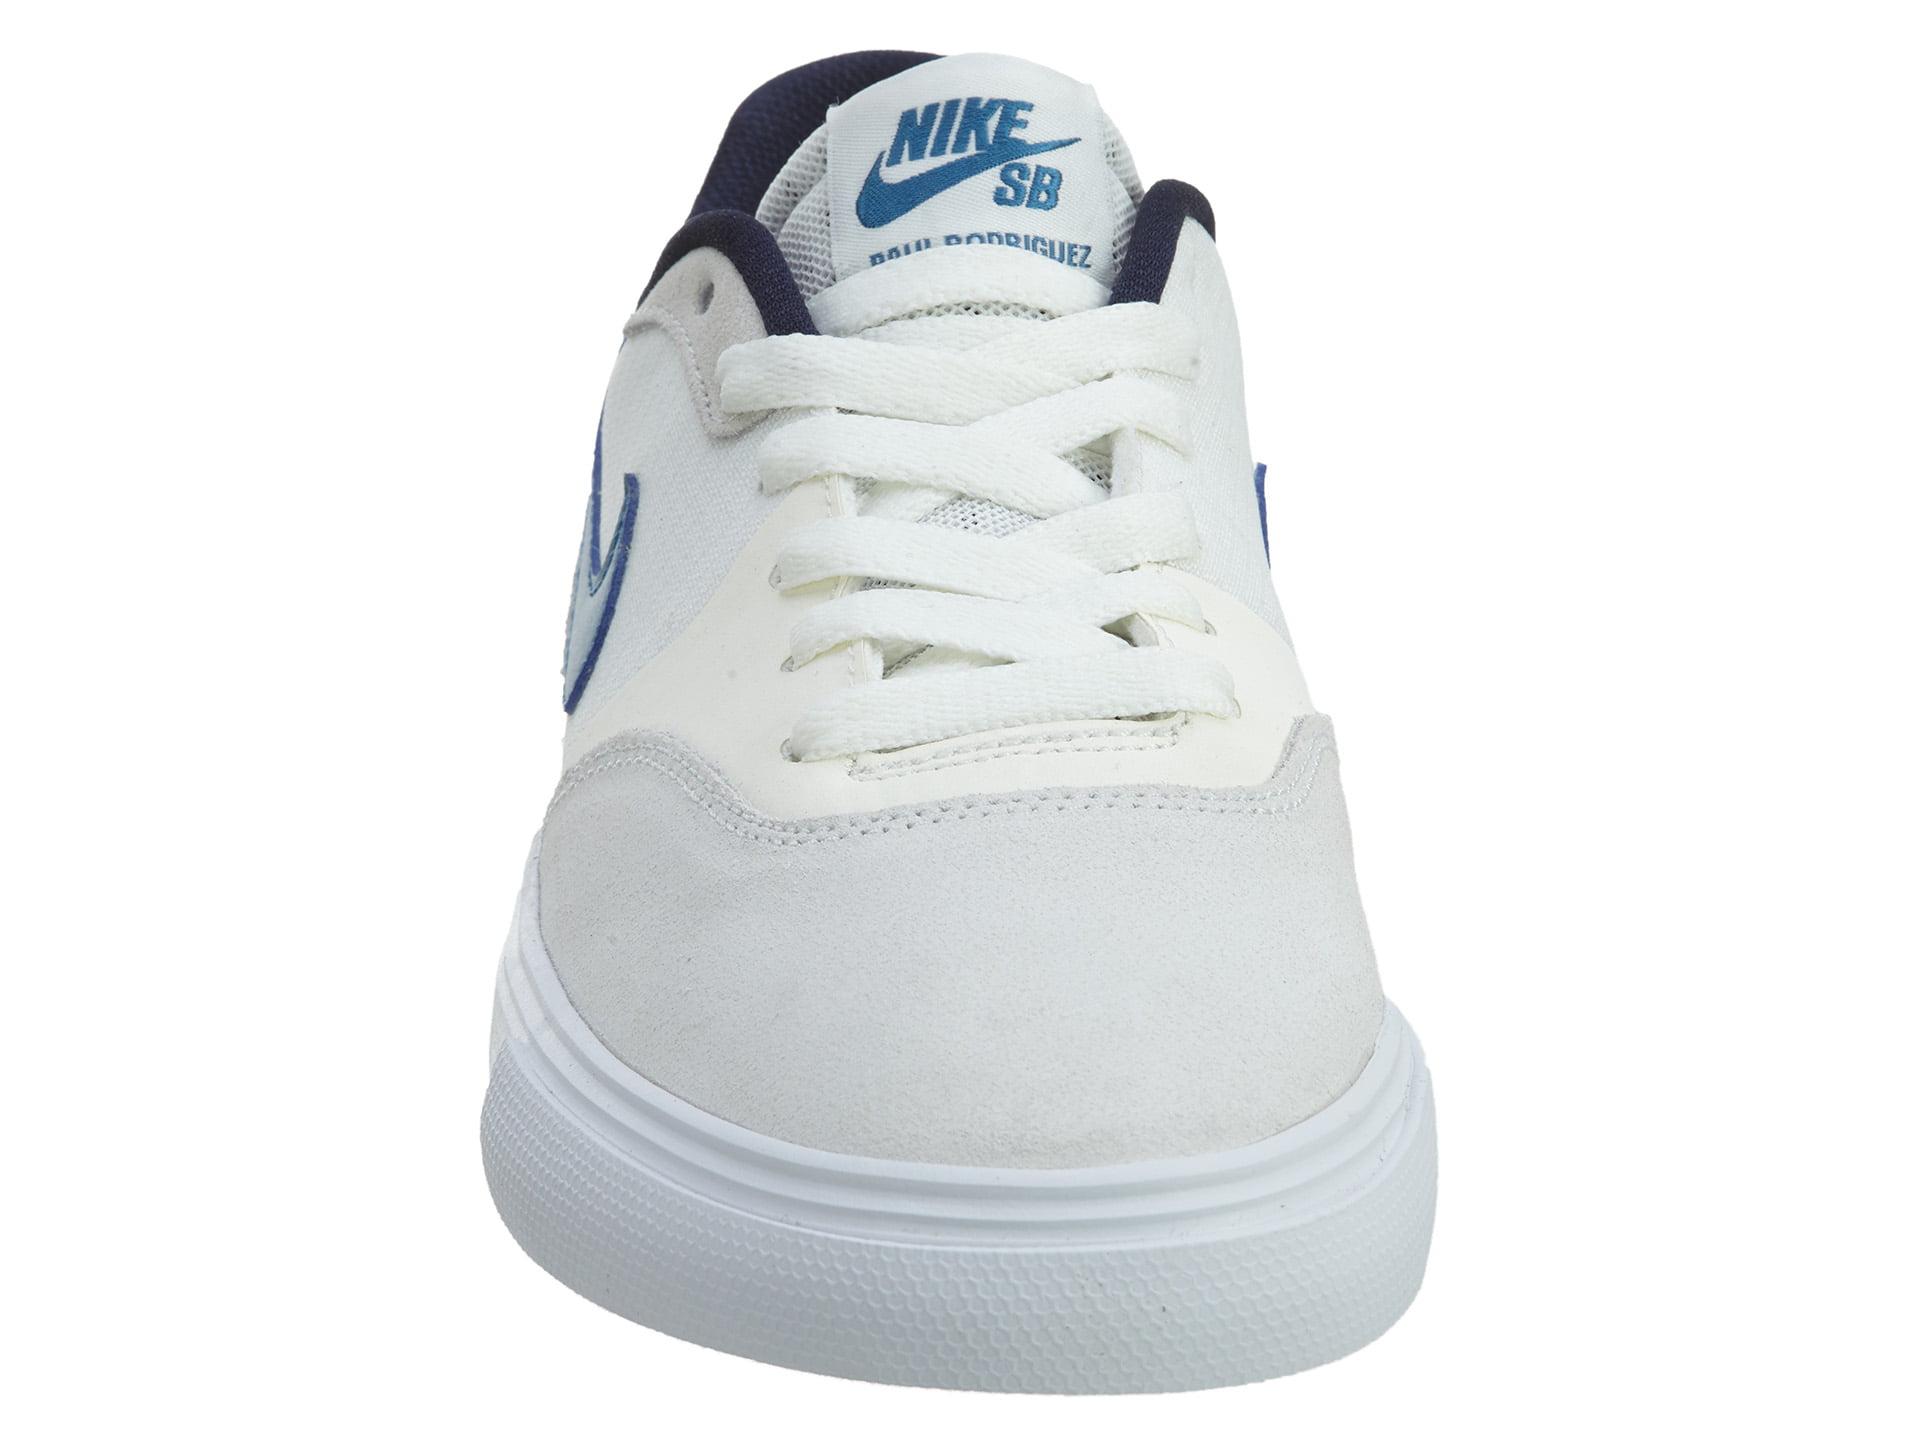 Nike Paul Rodriguez 9 Vr Mens Style : 819844